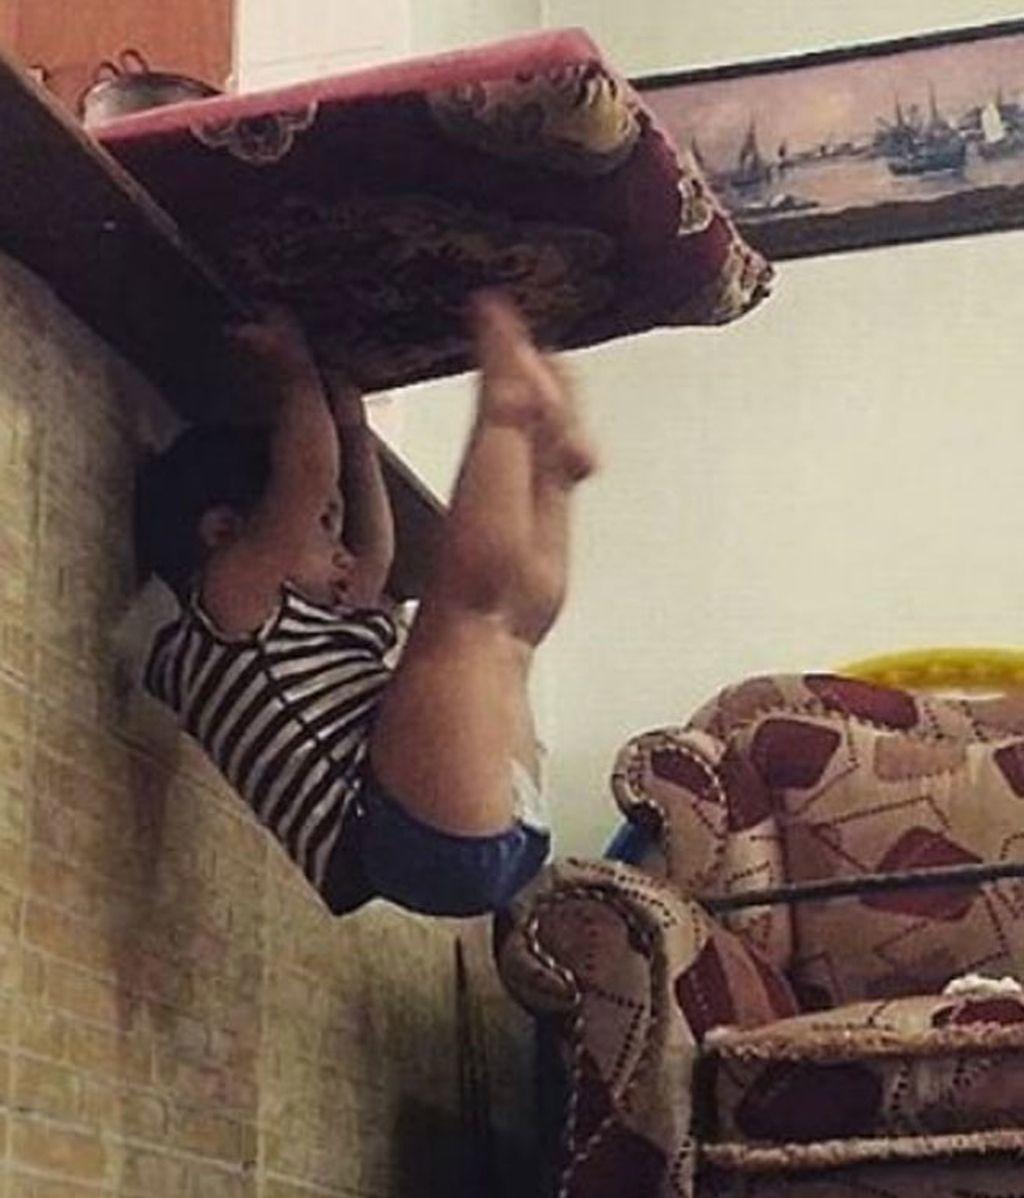 Un gimnasta con mucho futuro